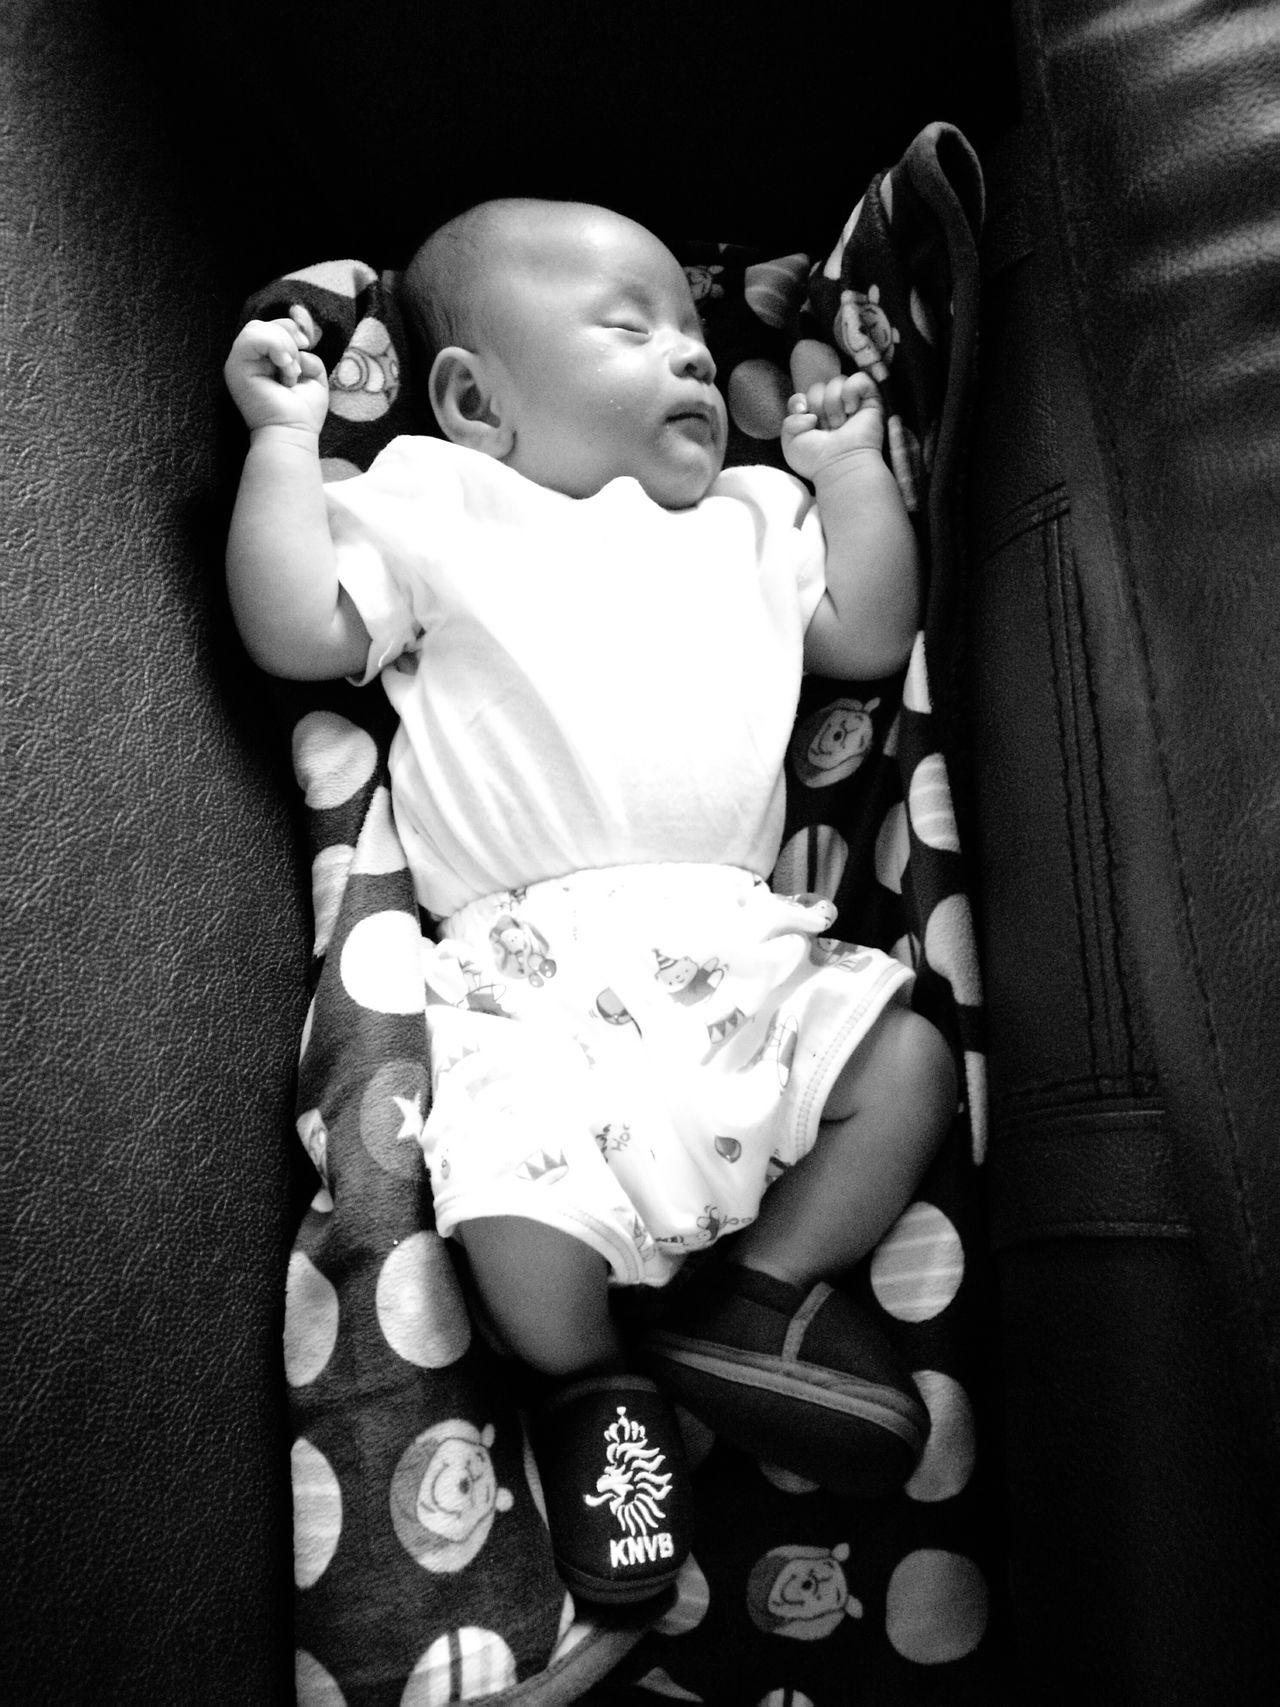 Baby Newborn HuaweiP9 Leicacamera Babyhood